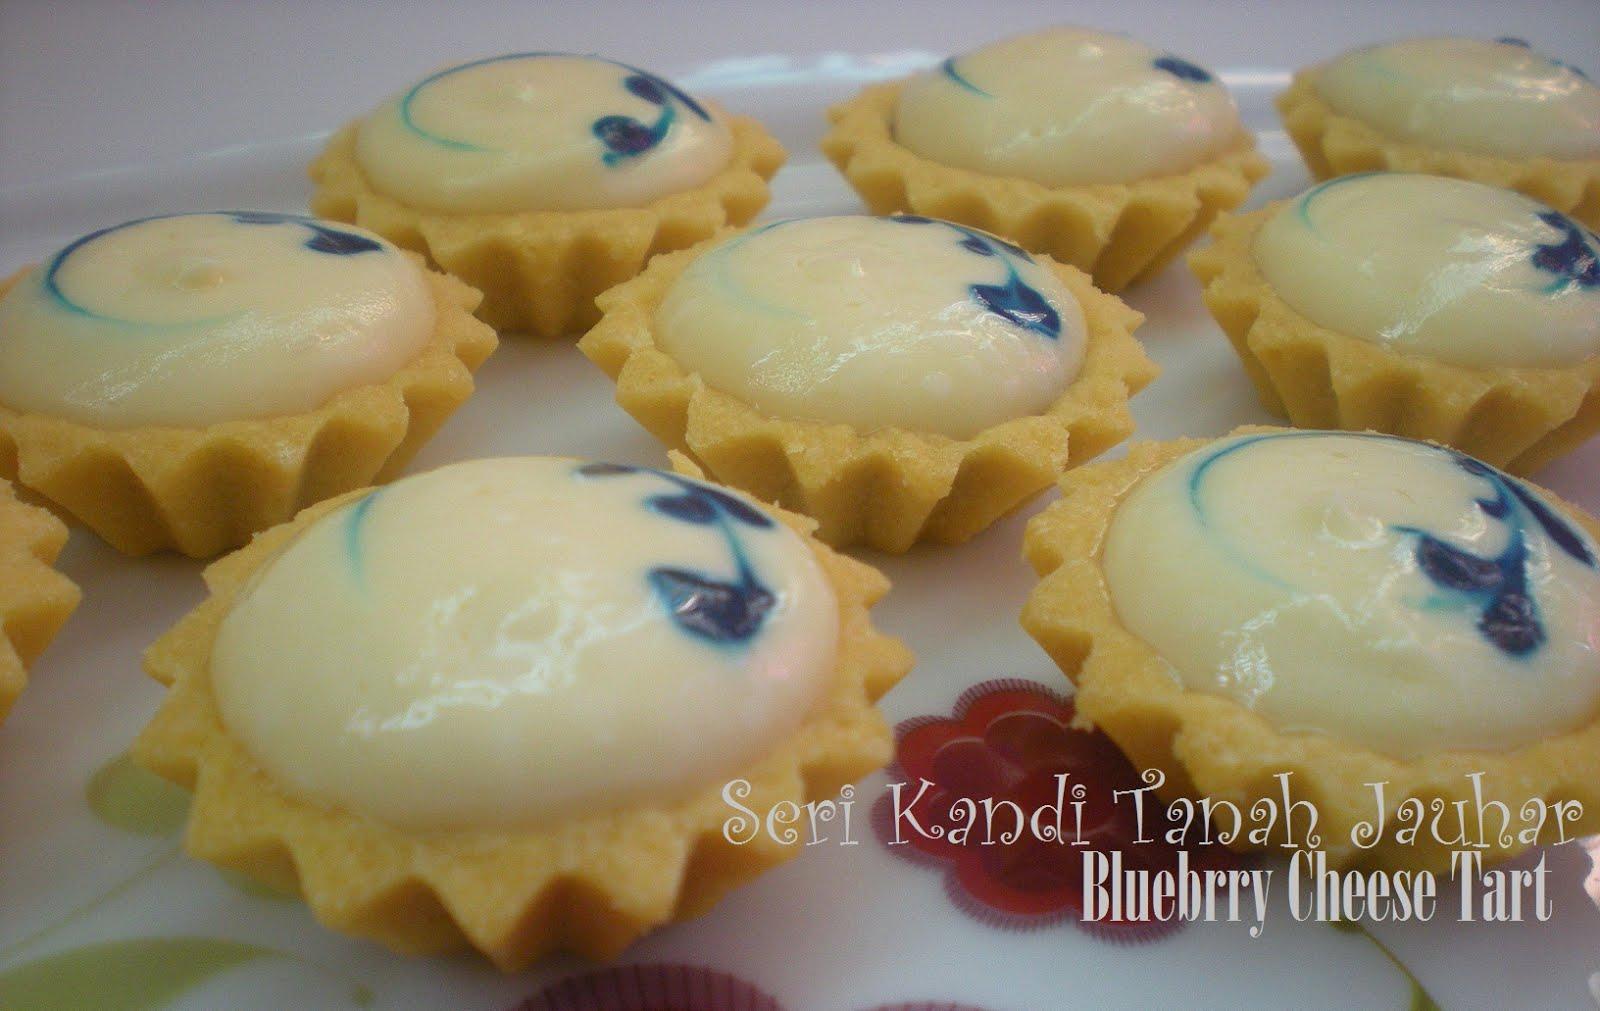 resepi blueberry cheese tart sukatan cawan